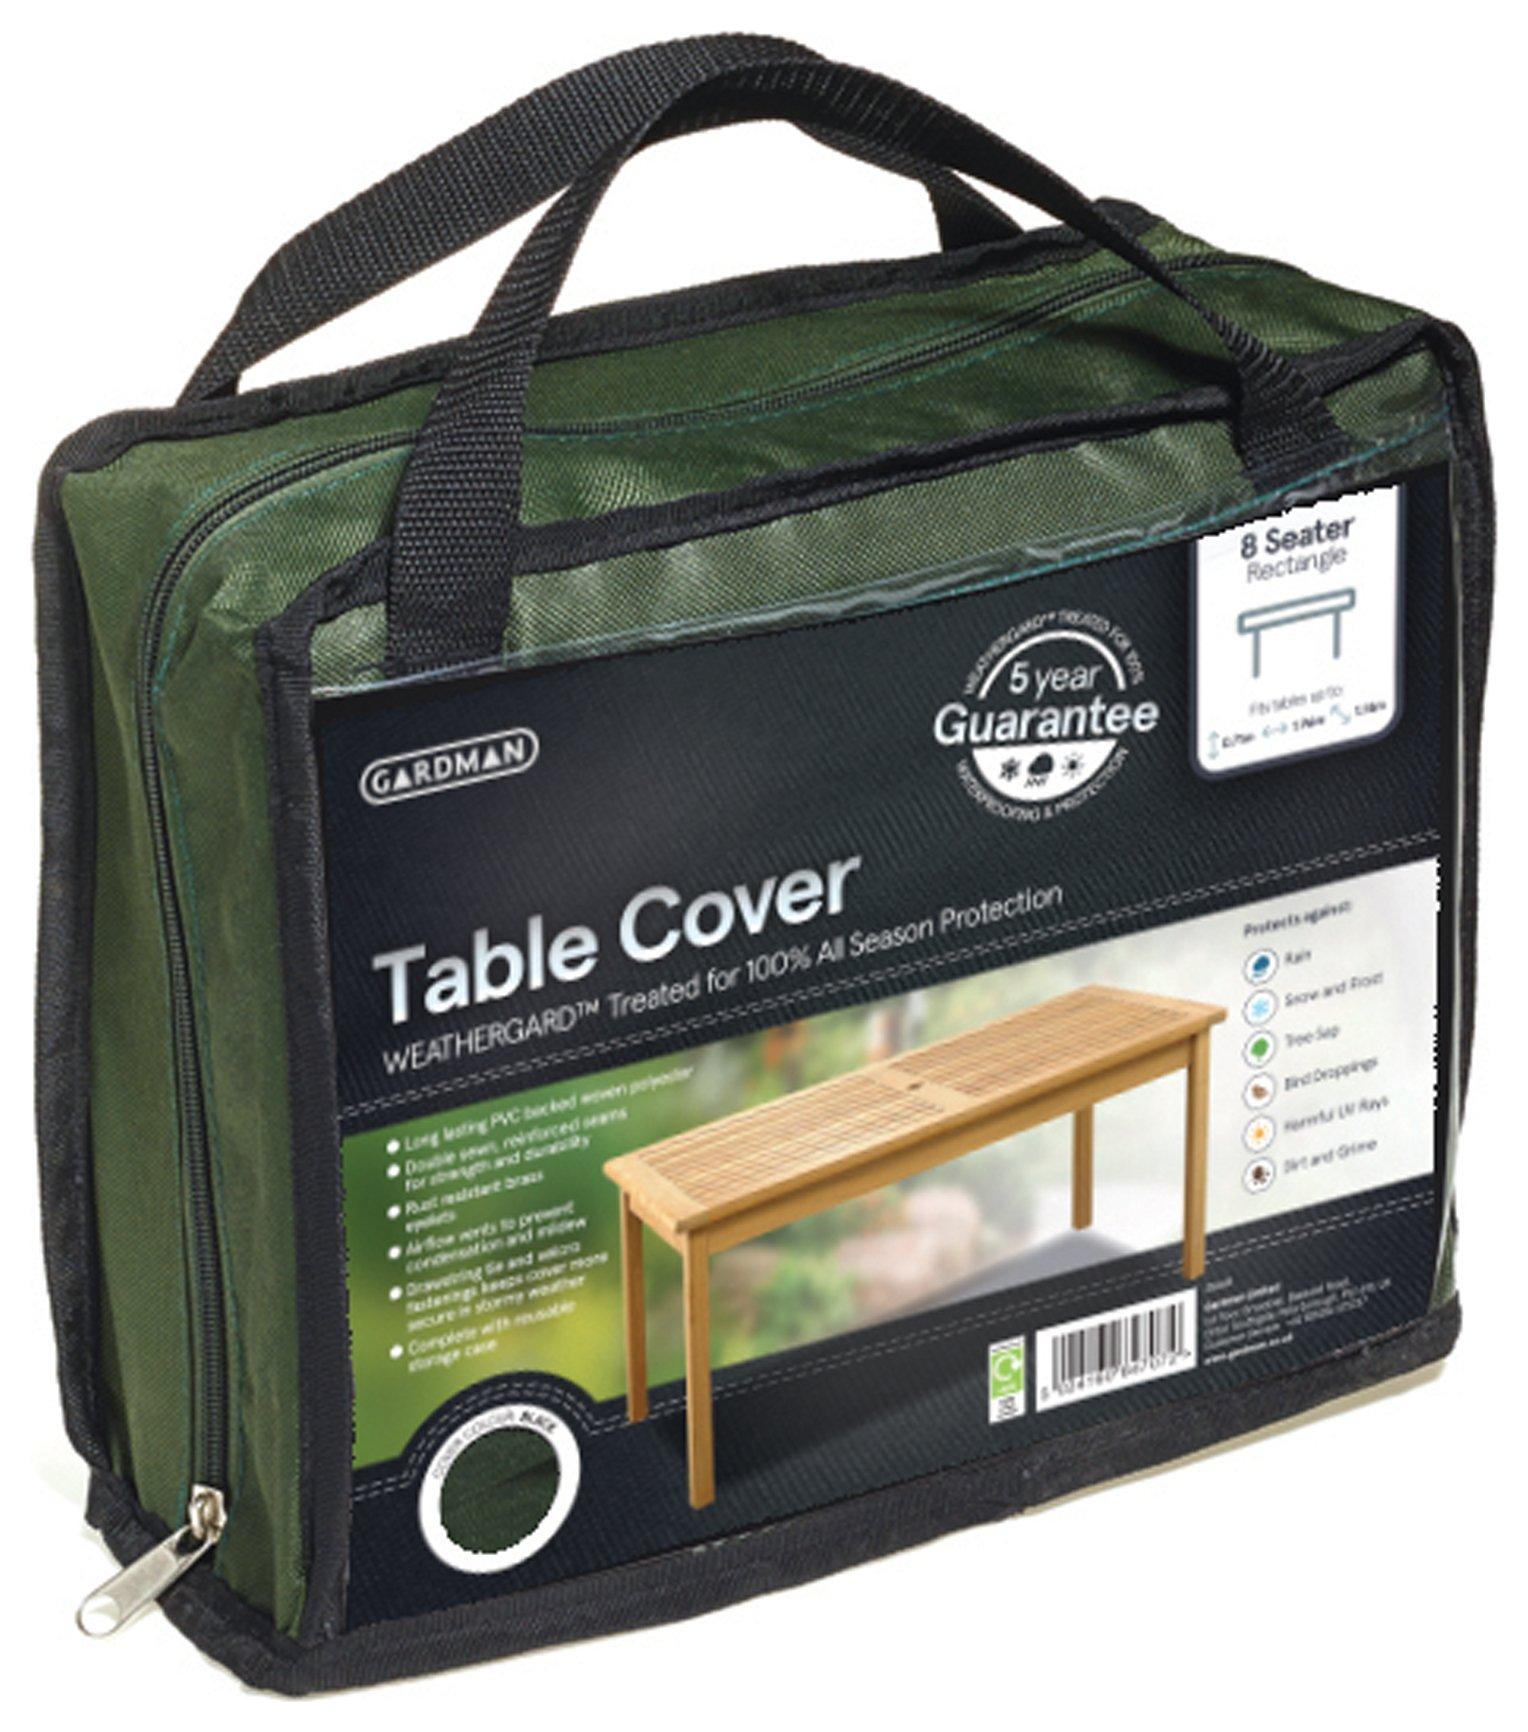 Gardman - Rectangular - 8 Seater Table Cover - Greens